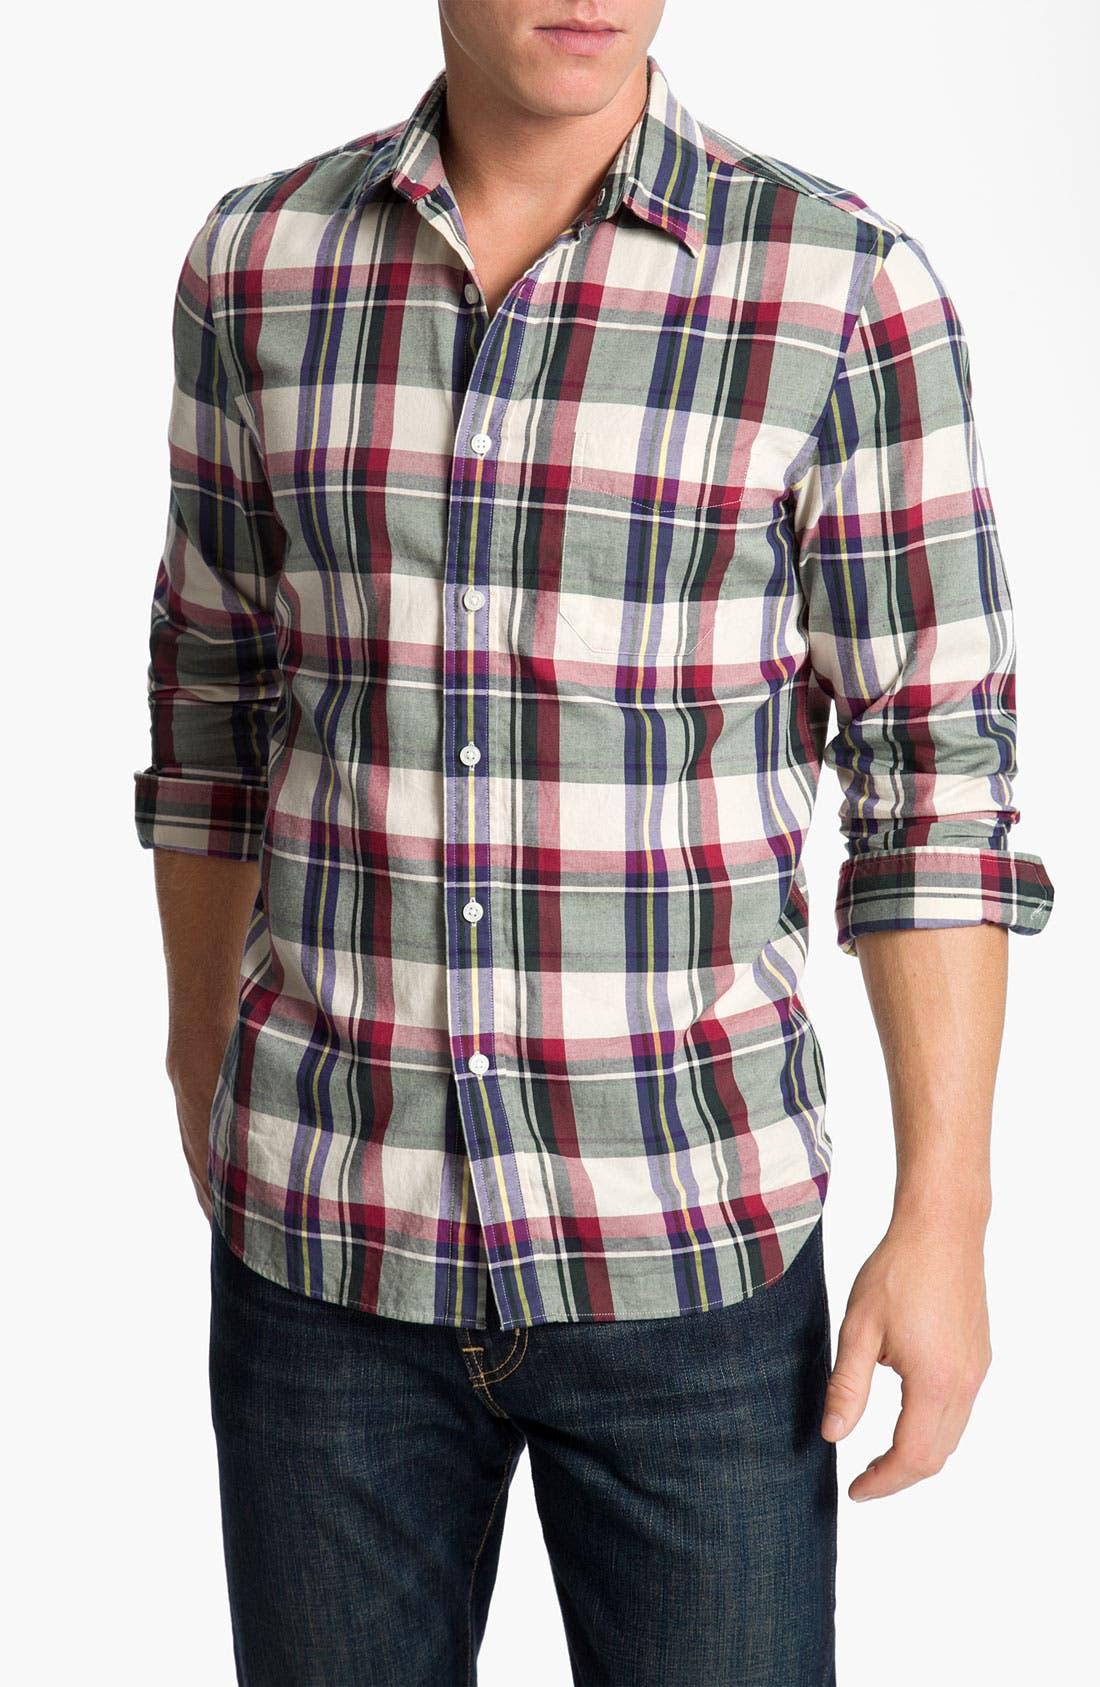 Alternate Image 1 Selected - Wallin & Bros. Plaid Sport Shirt